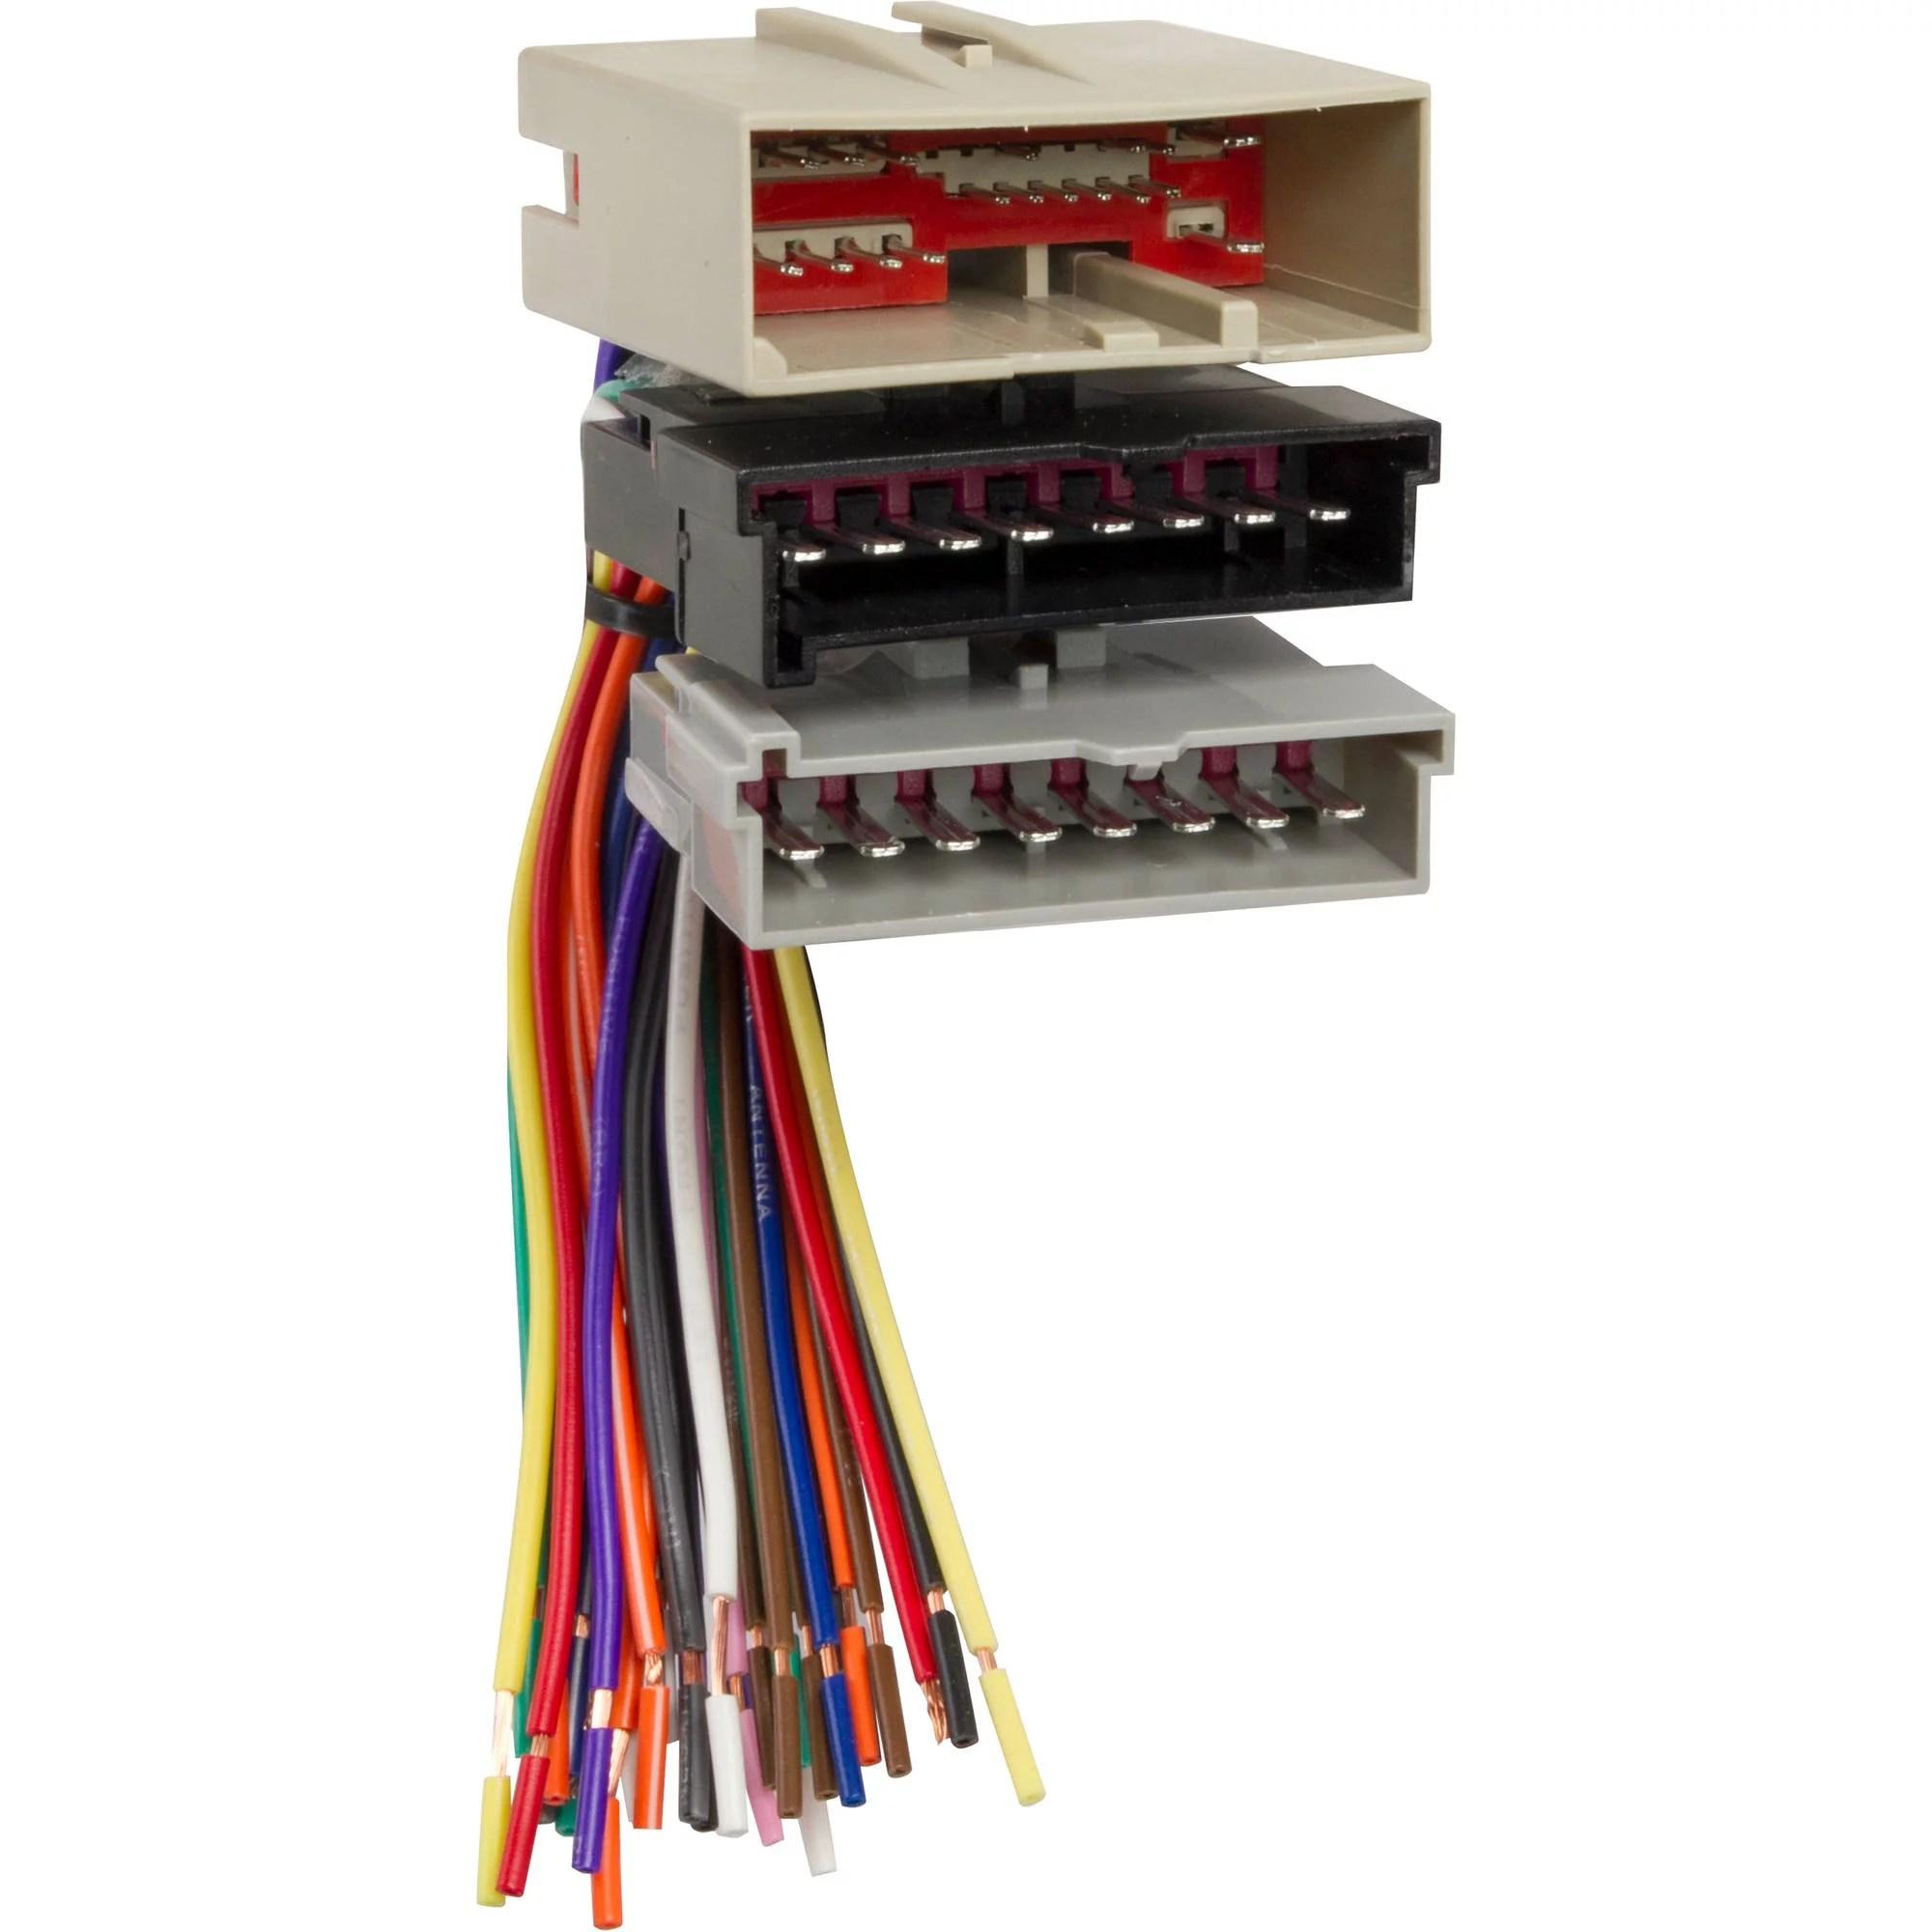 gm wiring harnesses walmart